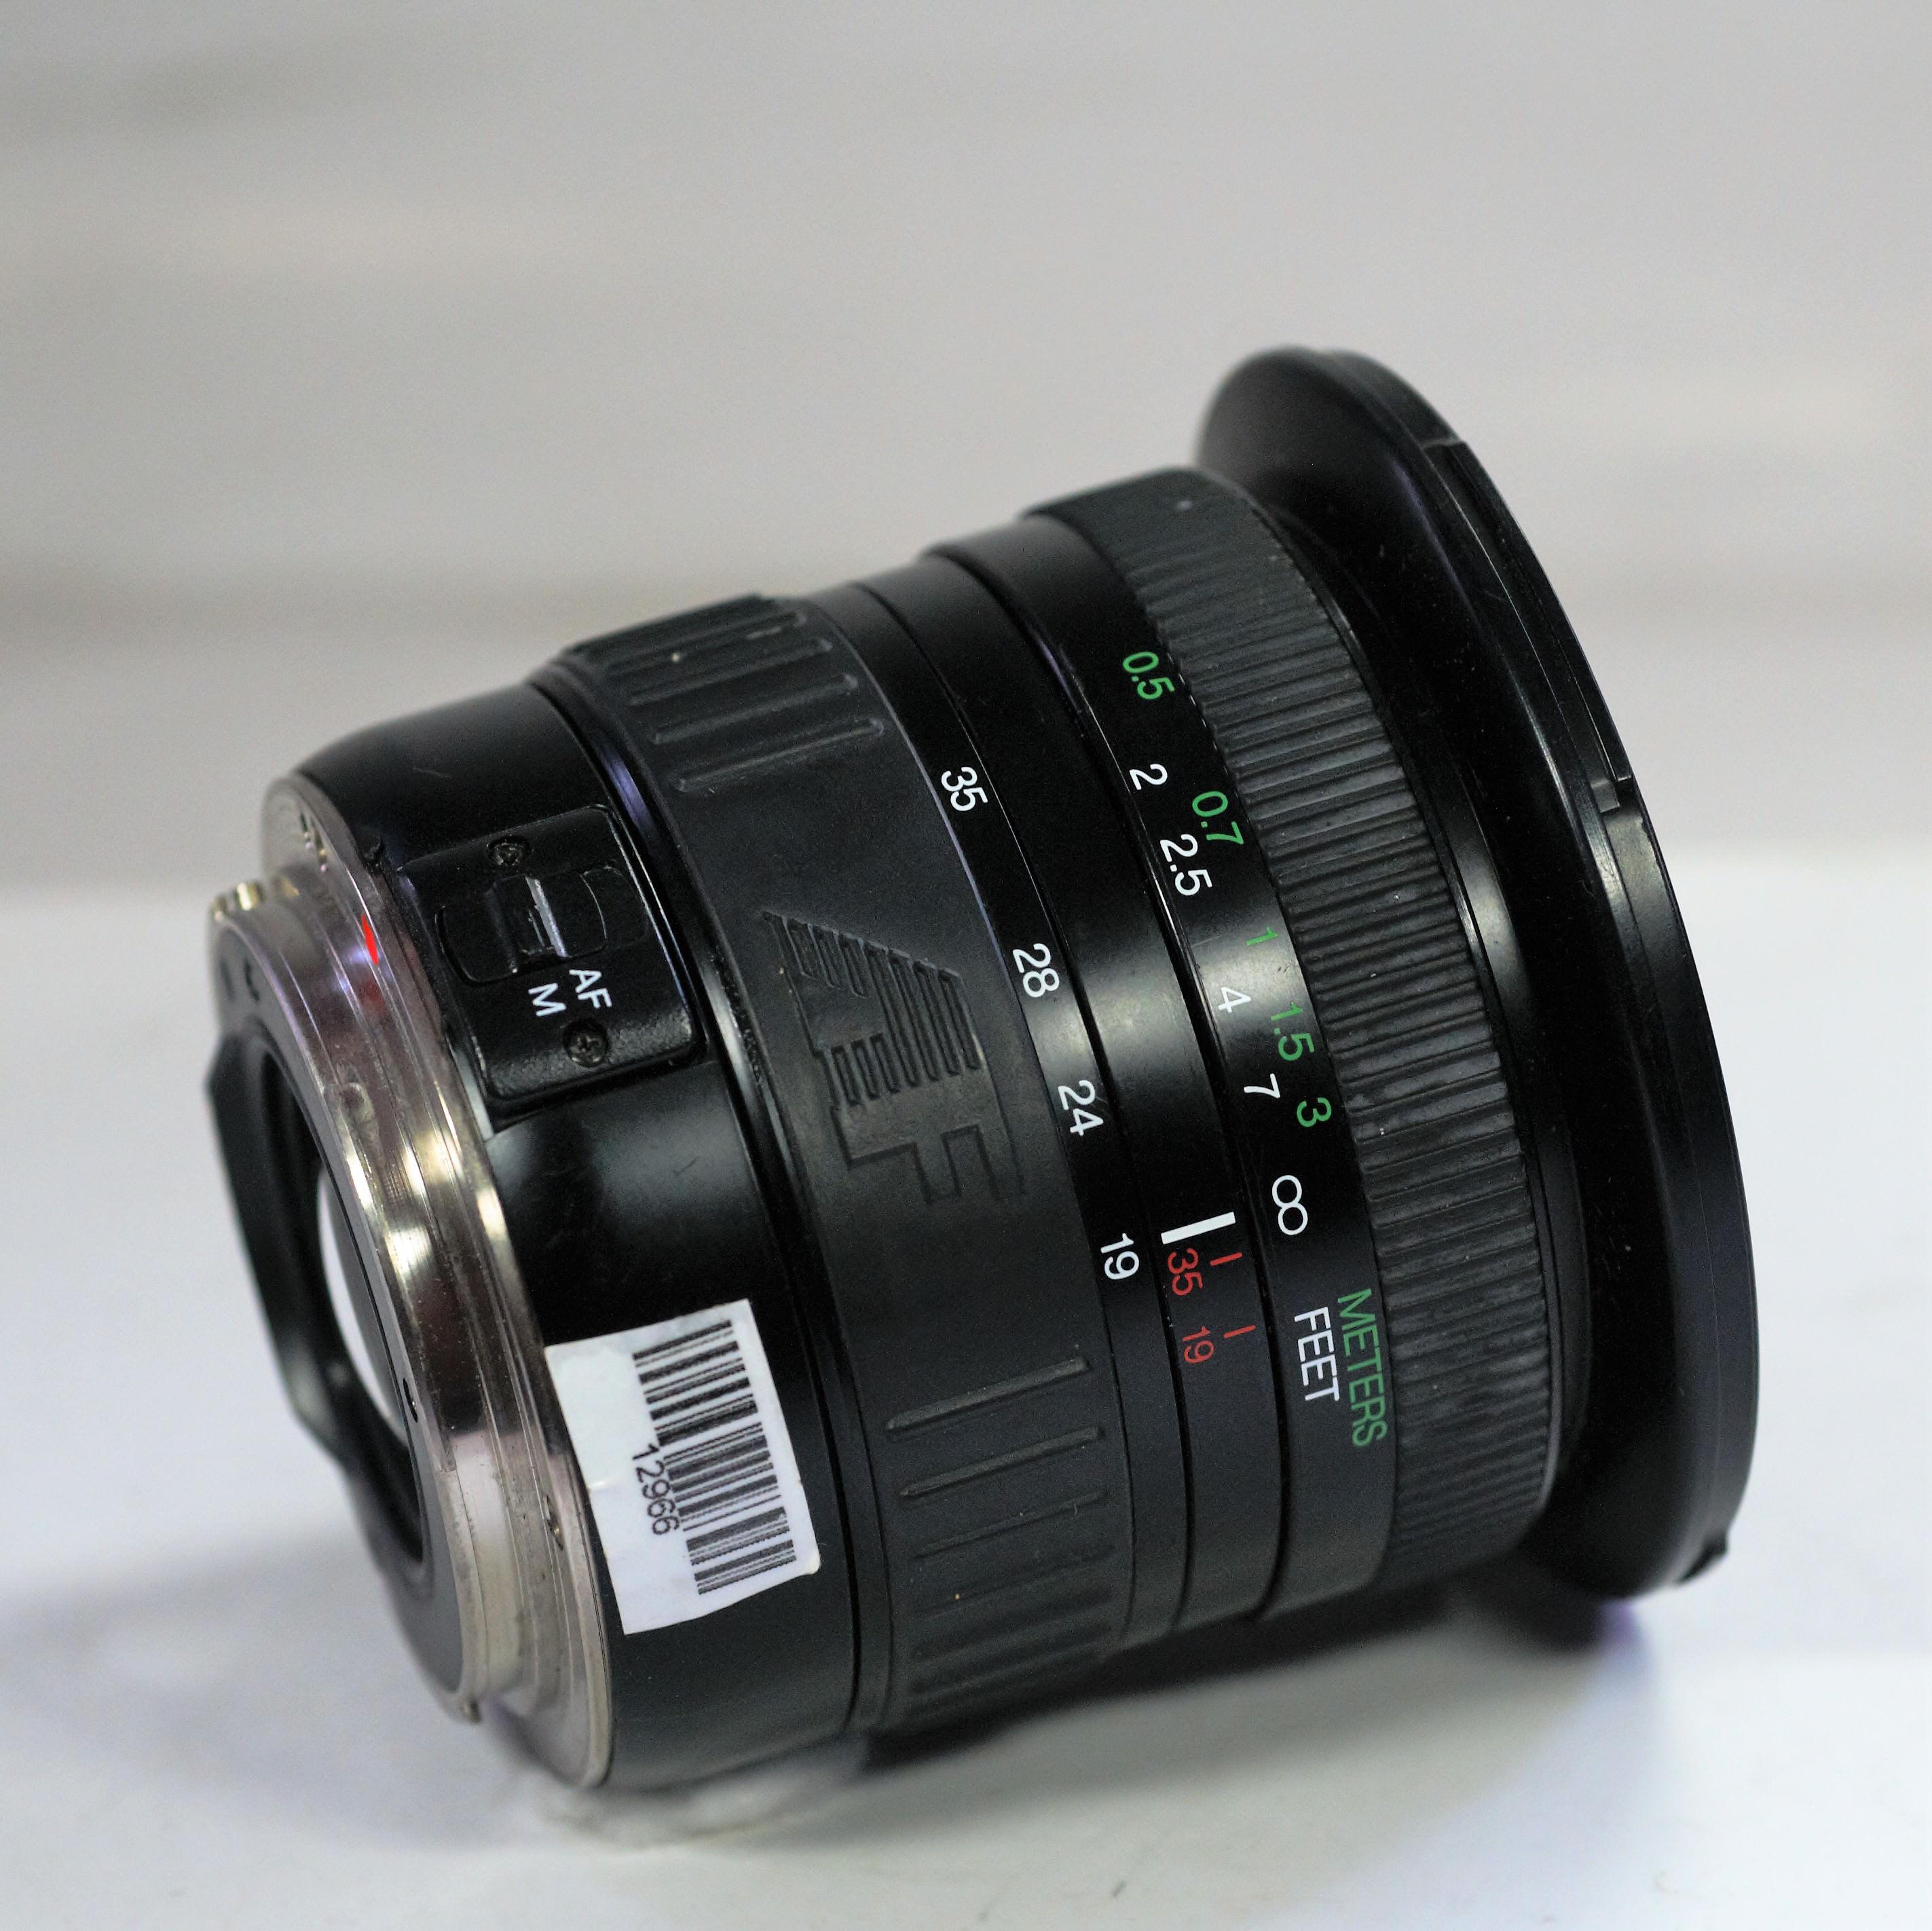 phoenix-19-35mm-f3-5-4-5-af-canon-19-35-3-5-4-5-12966